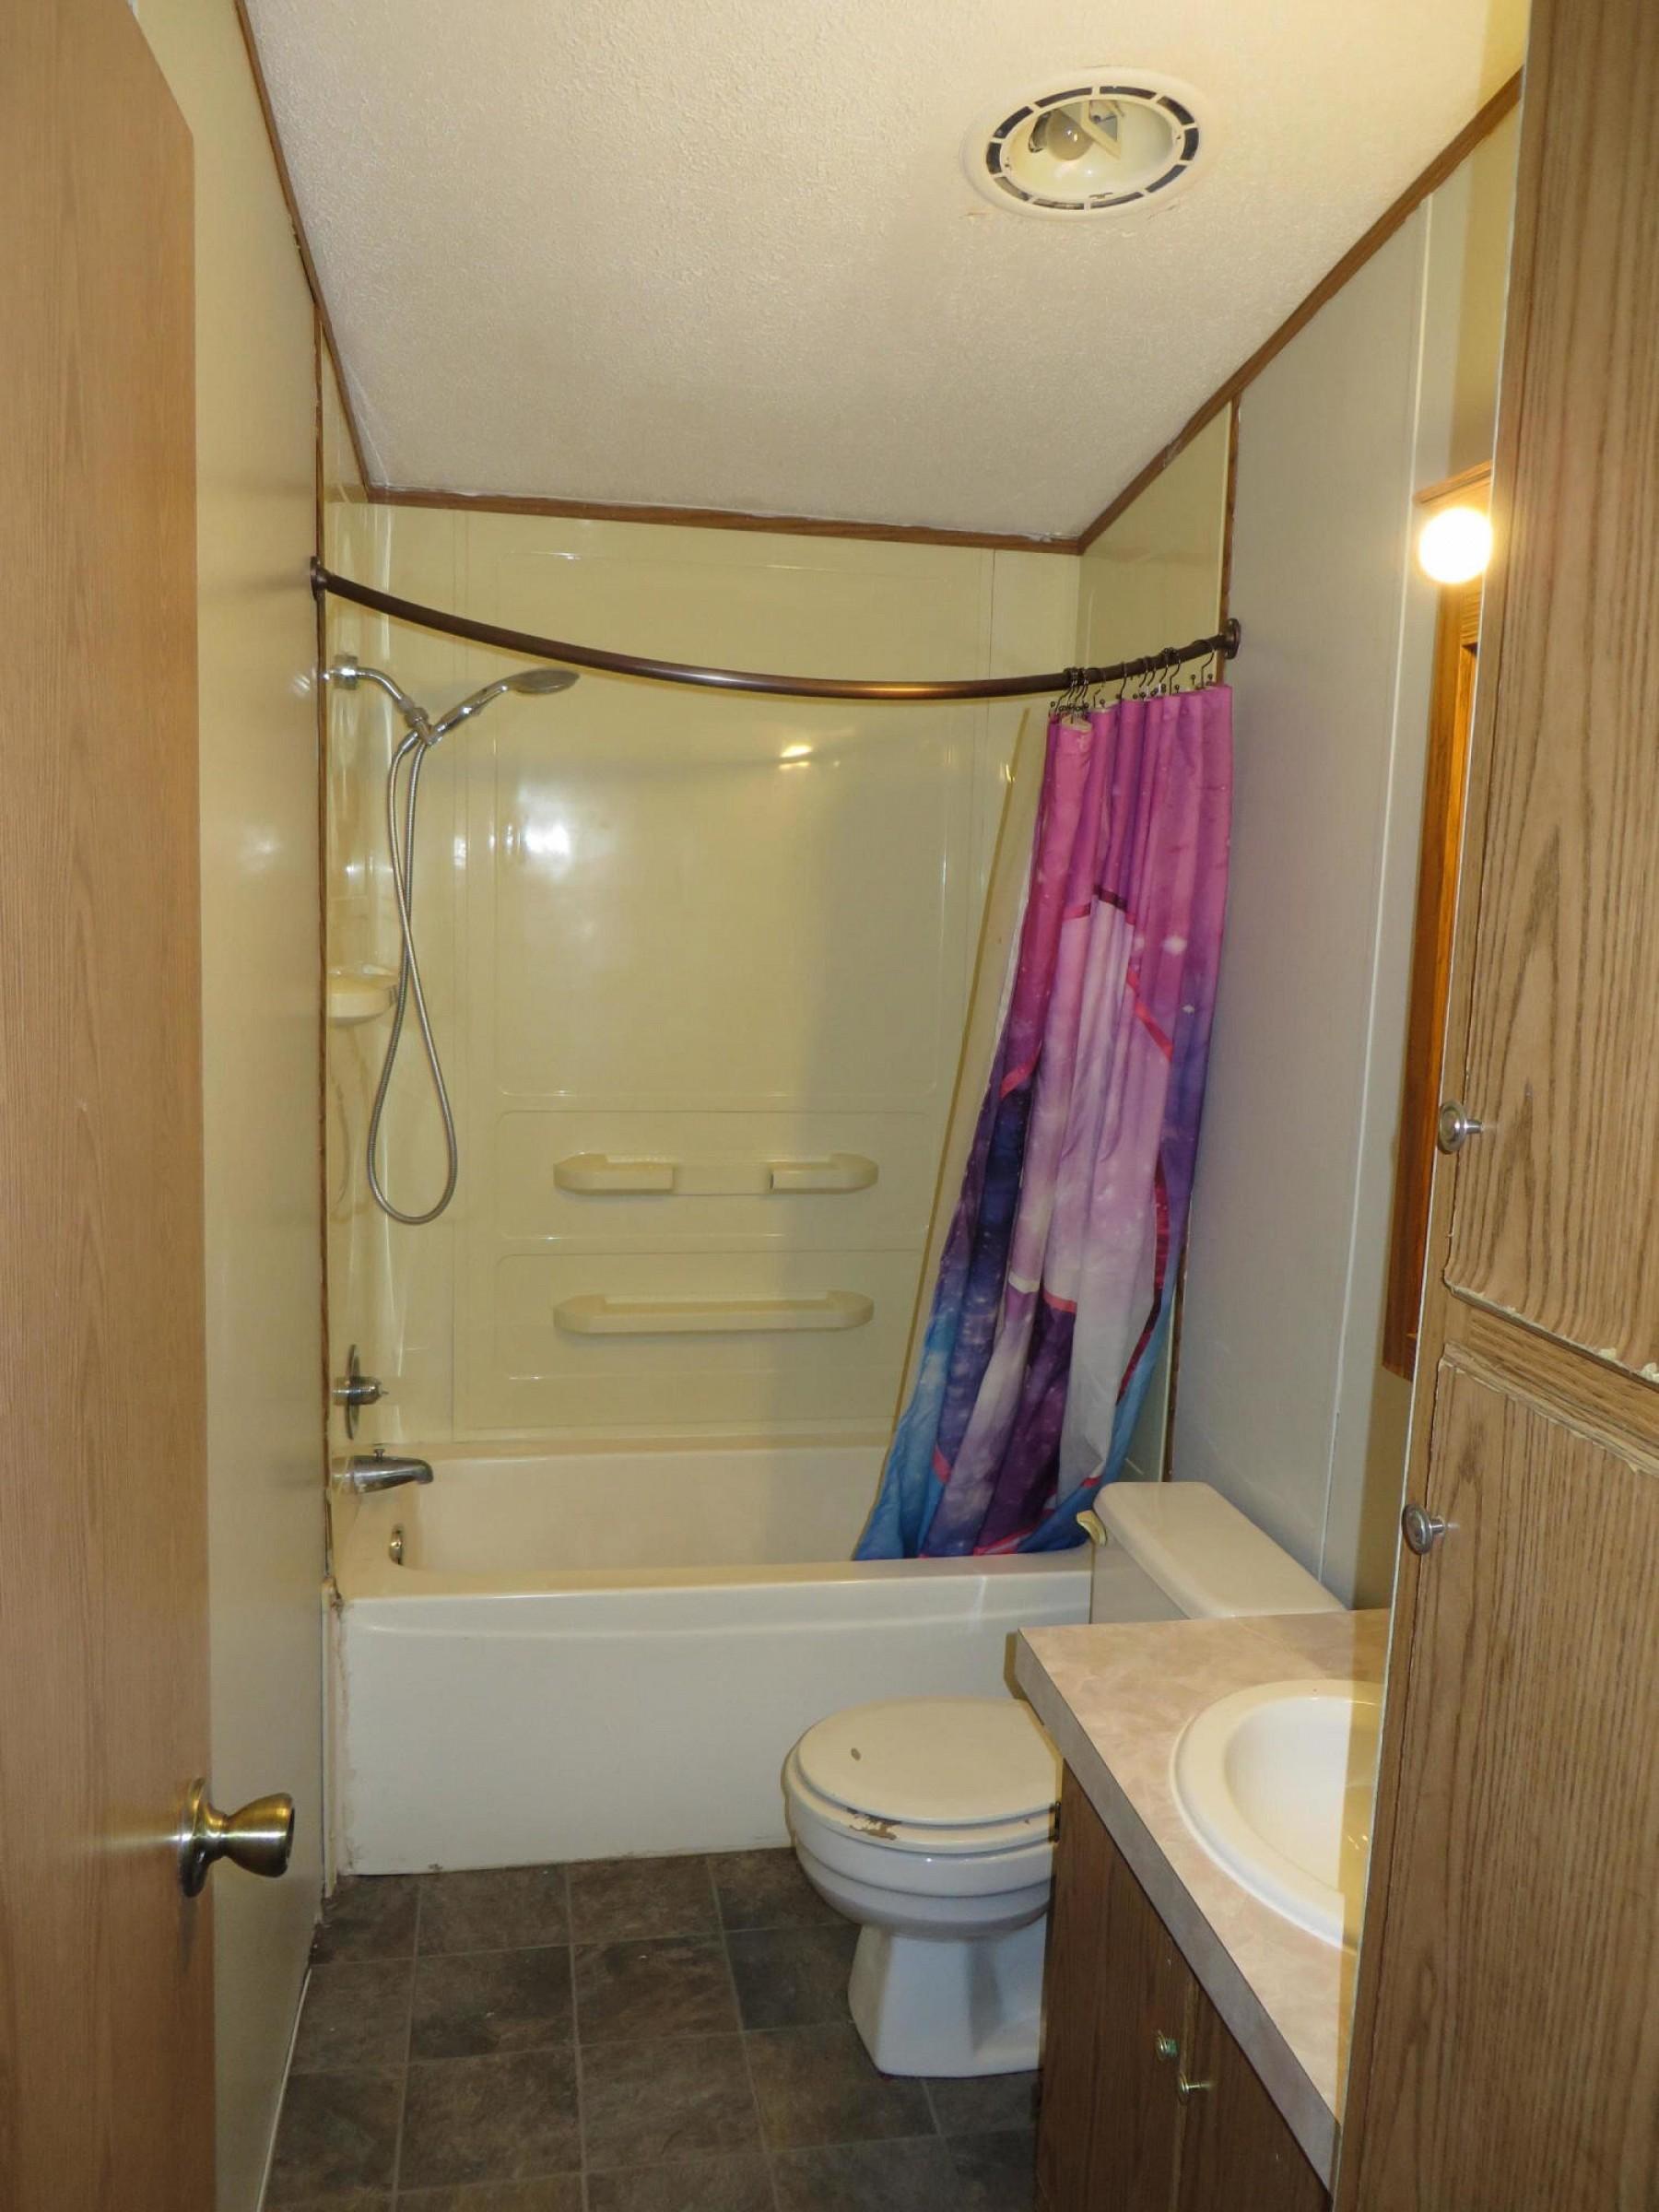 908 TumbleweedRoad, Brookings, SD 57006